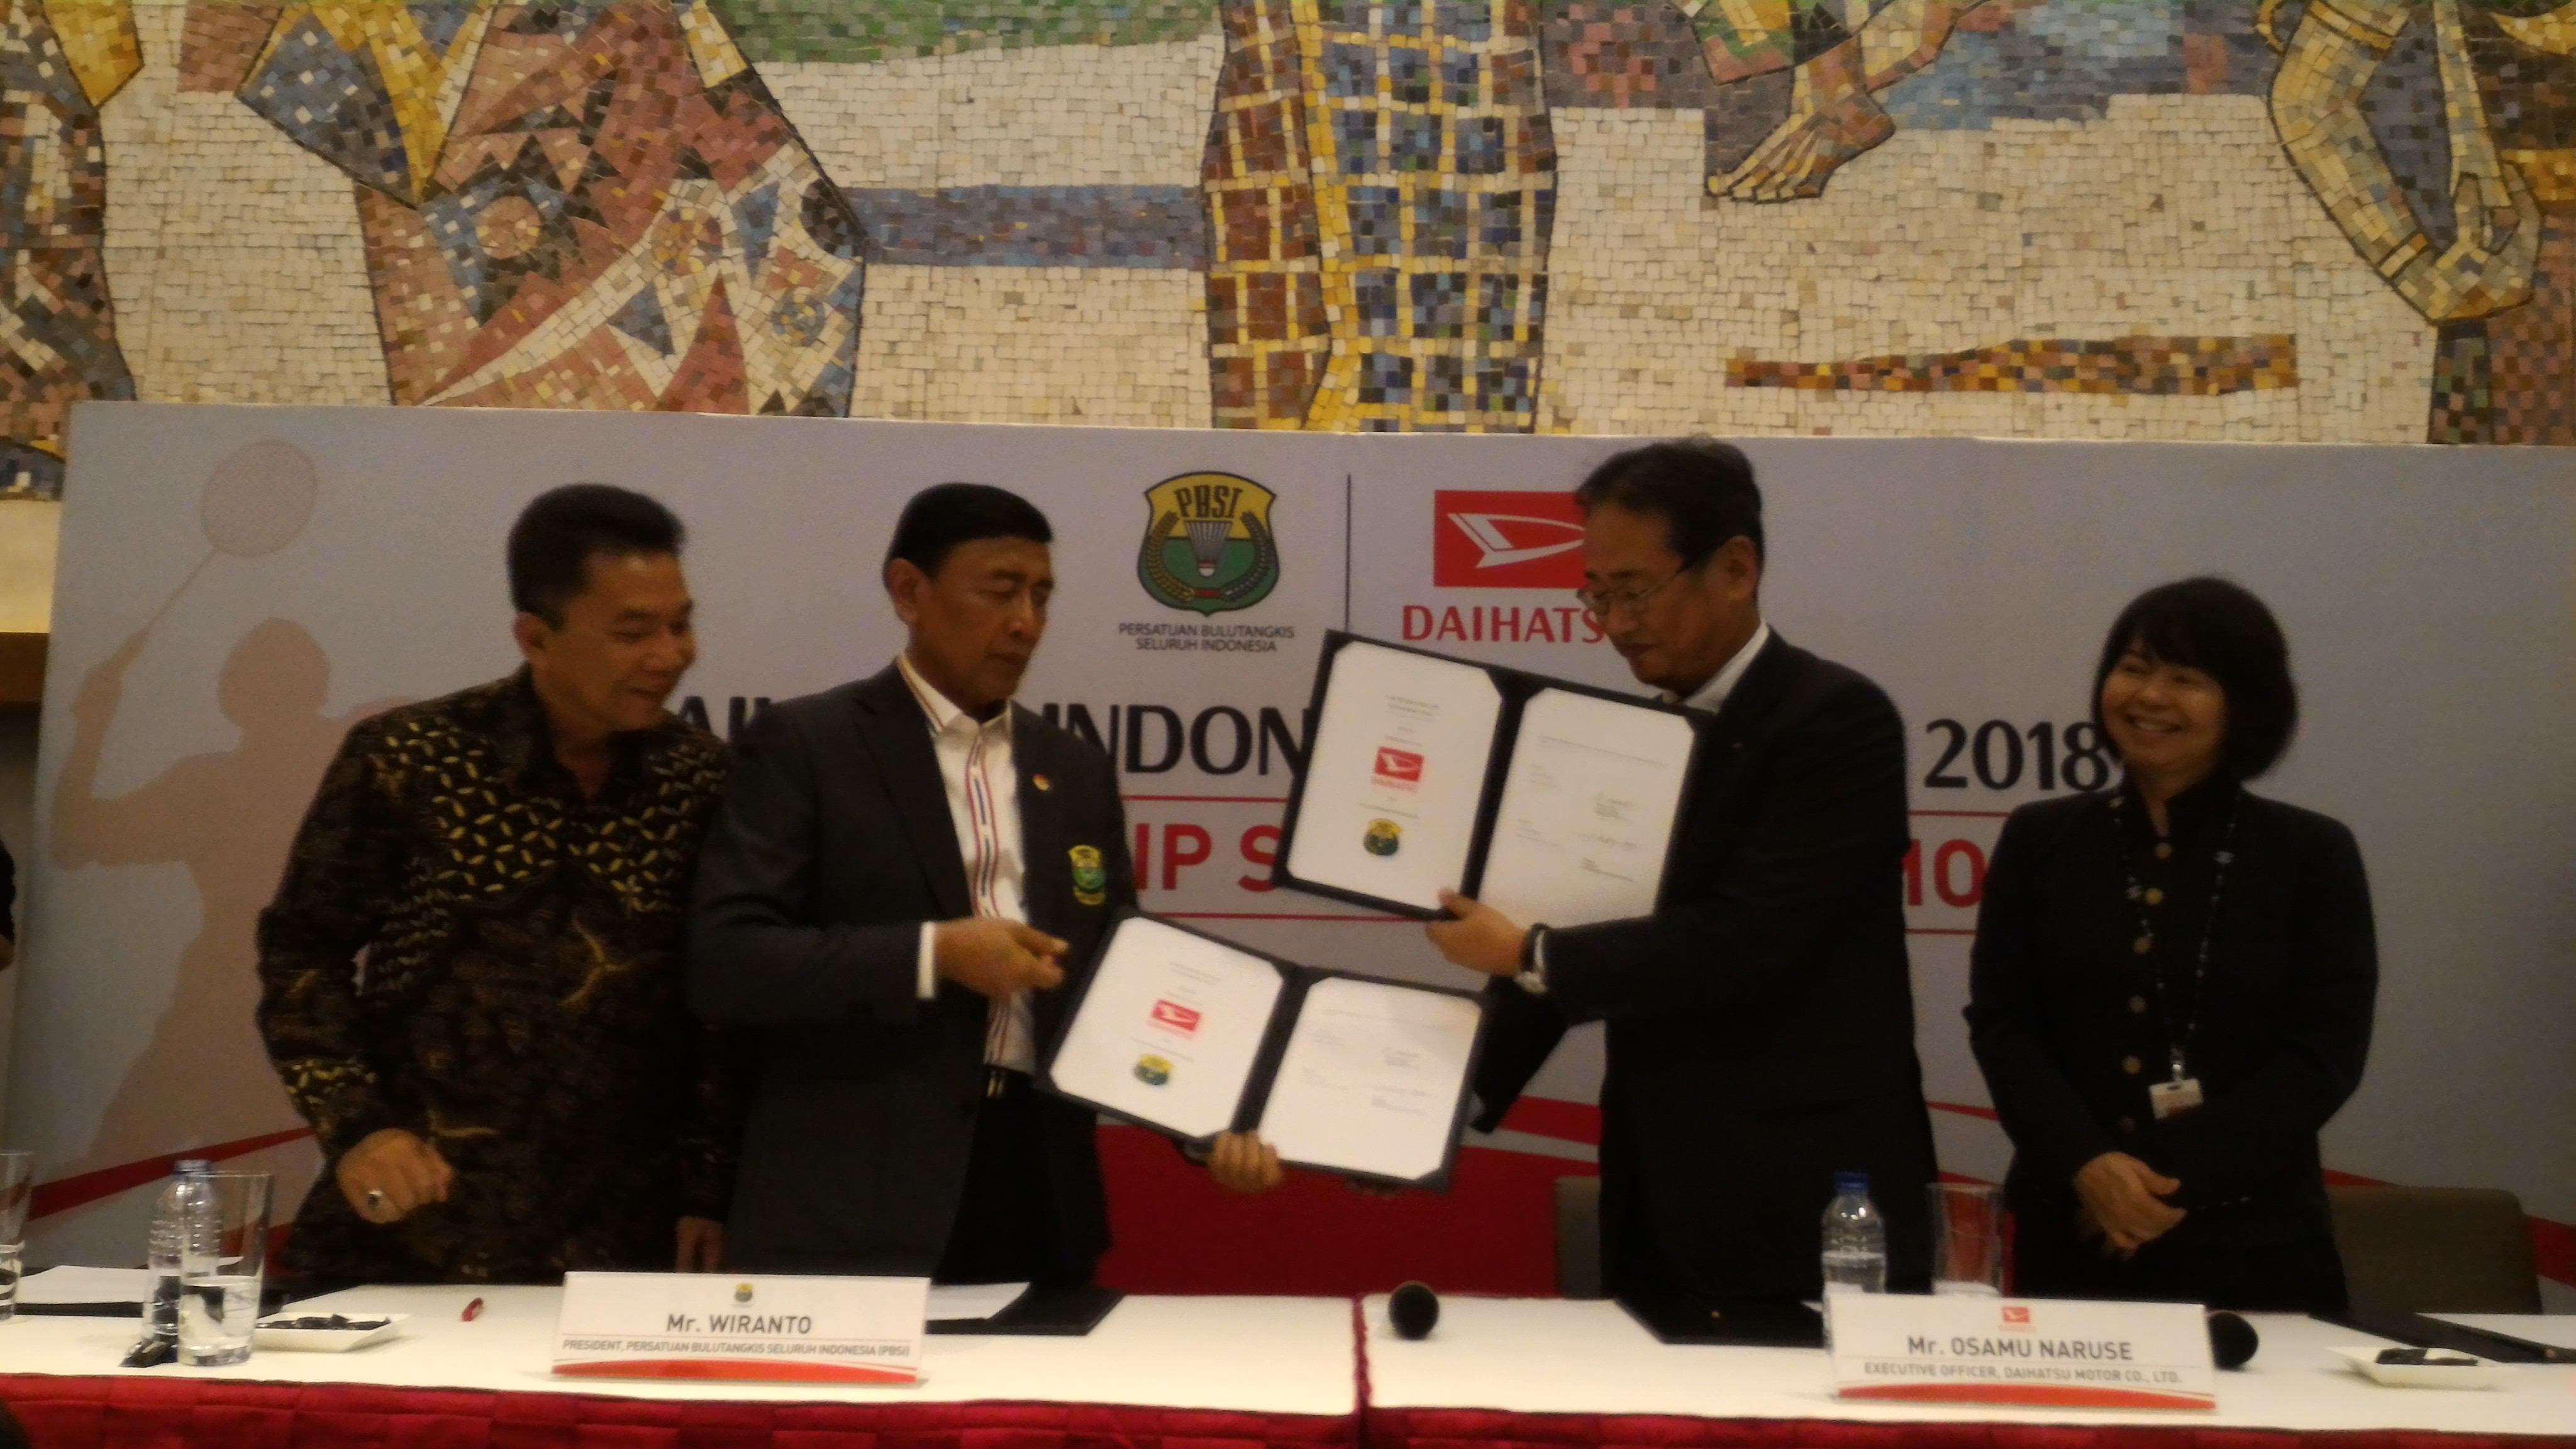 Daihatsu Umumkan Sponsor Tunggal Daihatsu Indonesia Master 2018